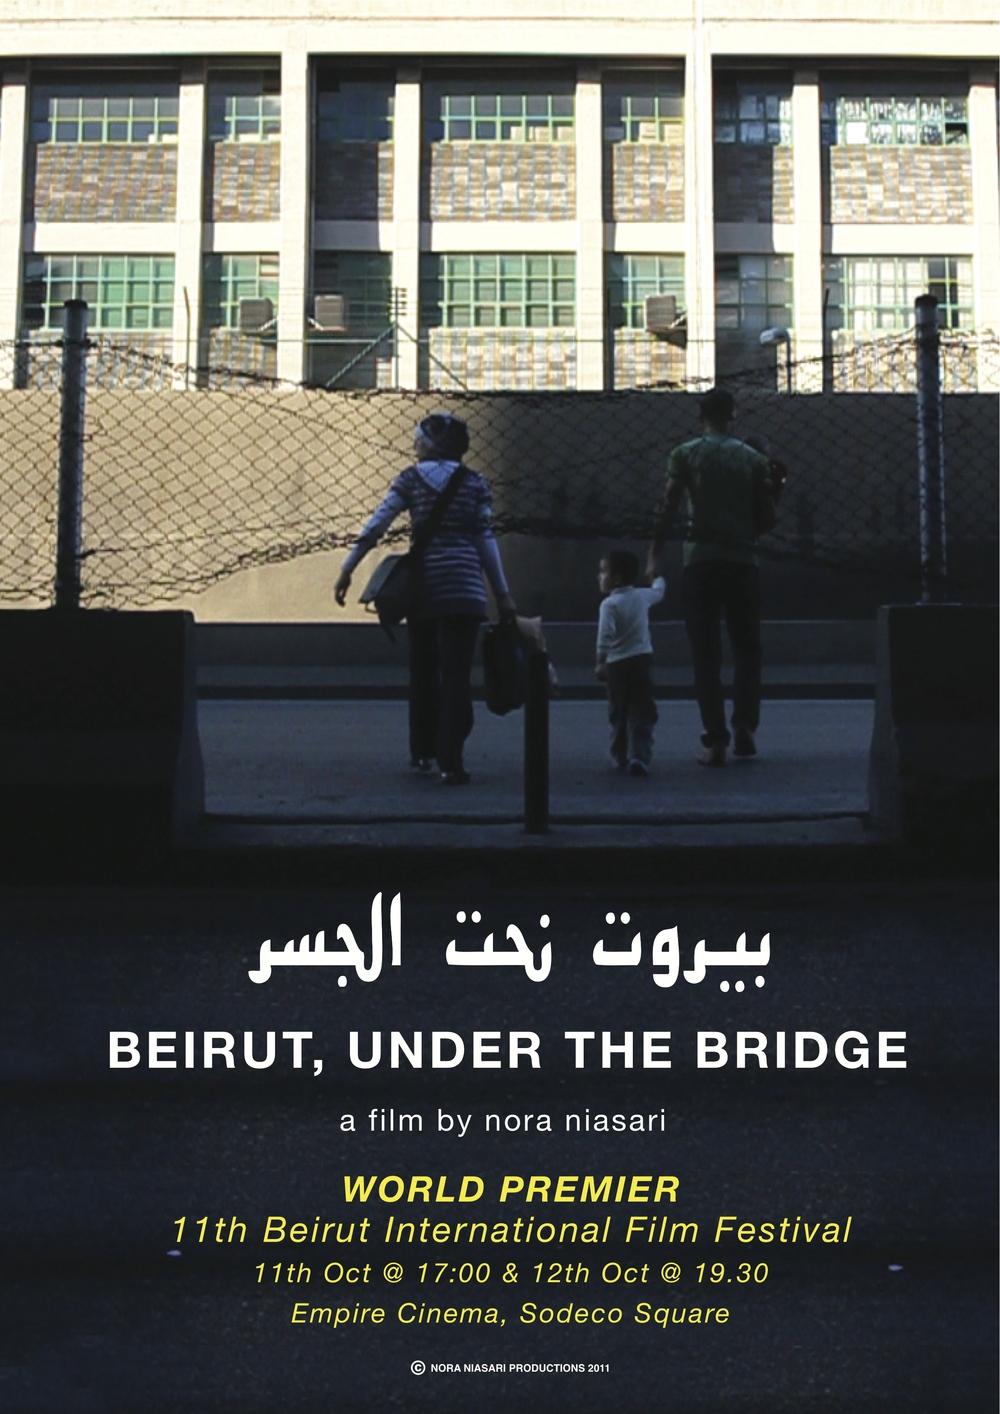 BIFF_Beirut,Under the Bridge_Invite